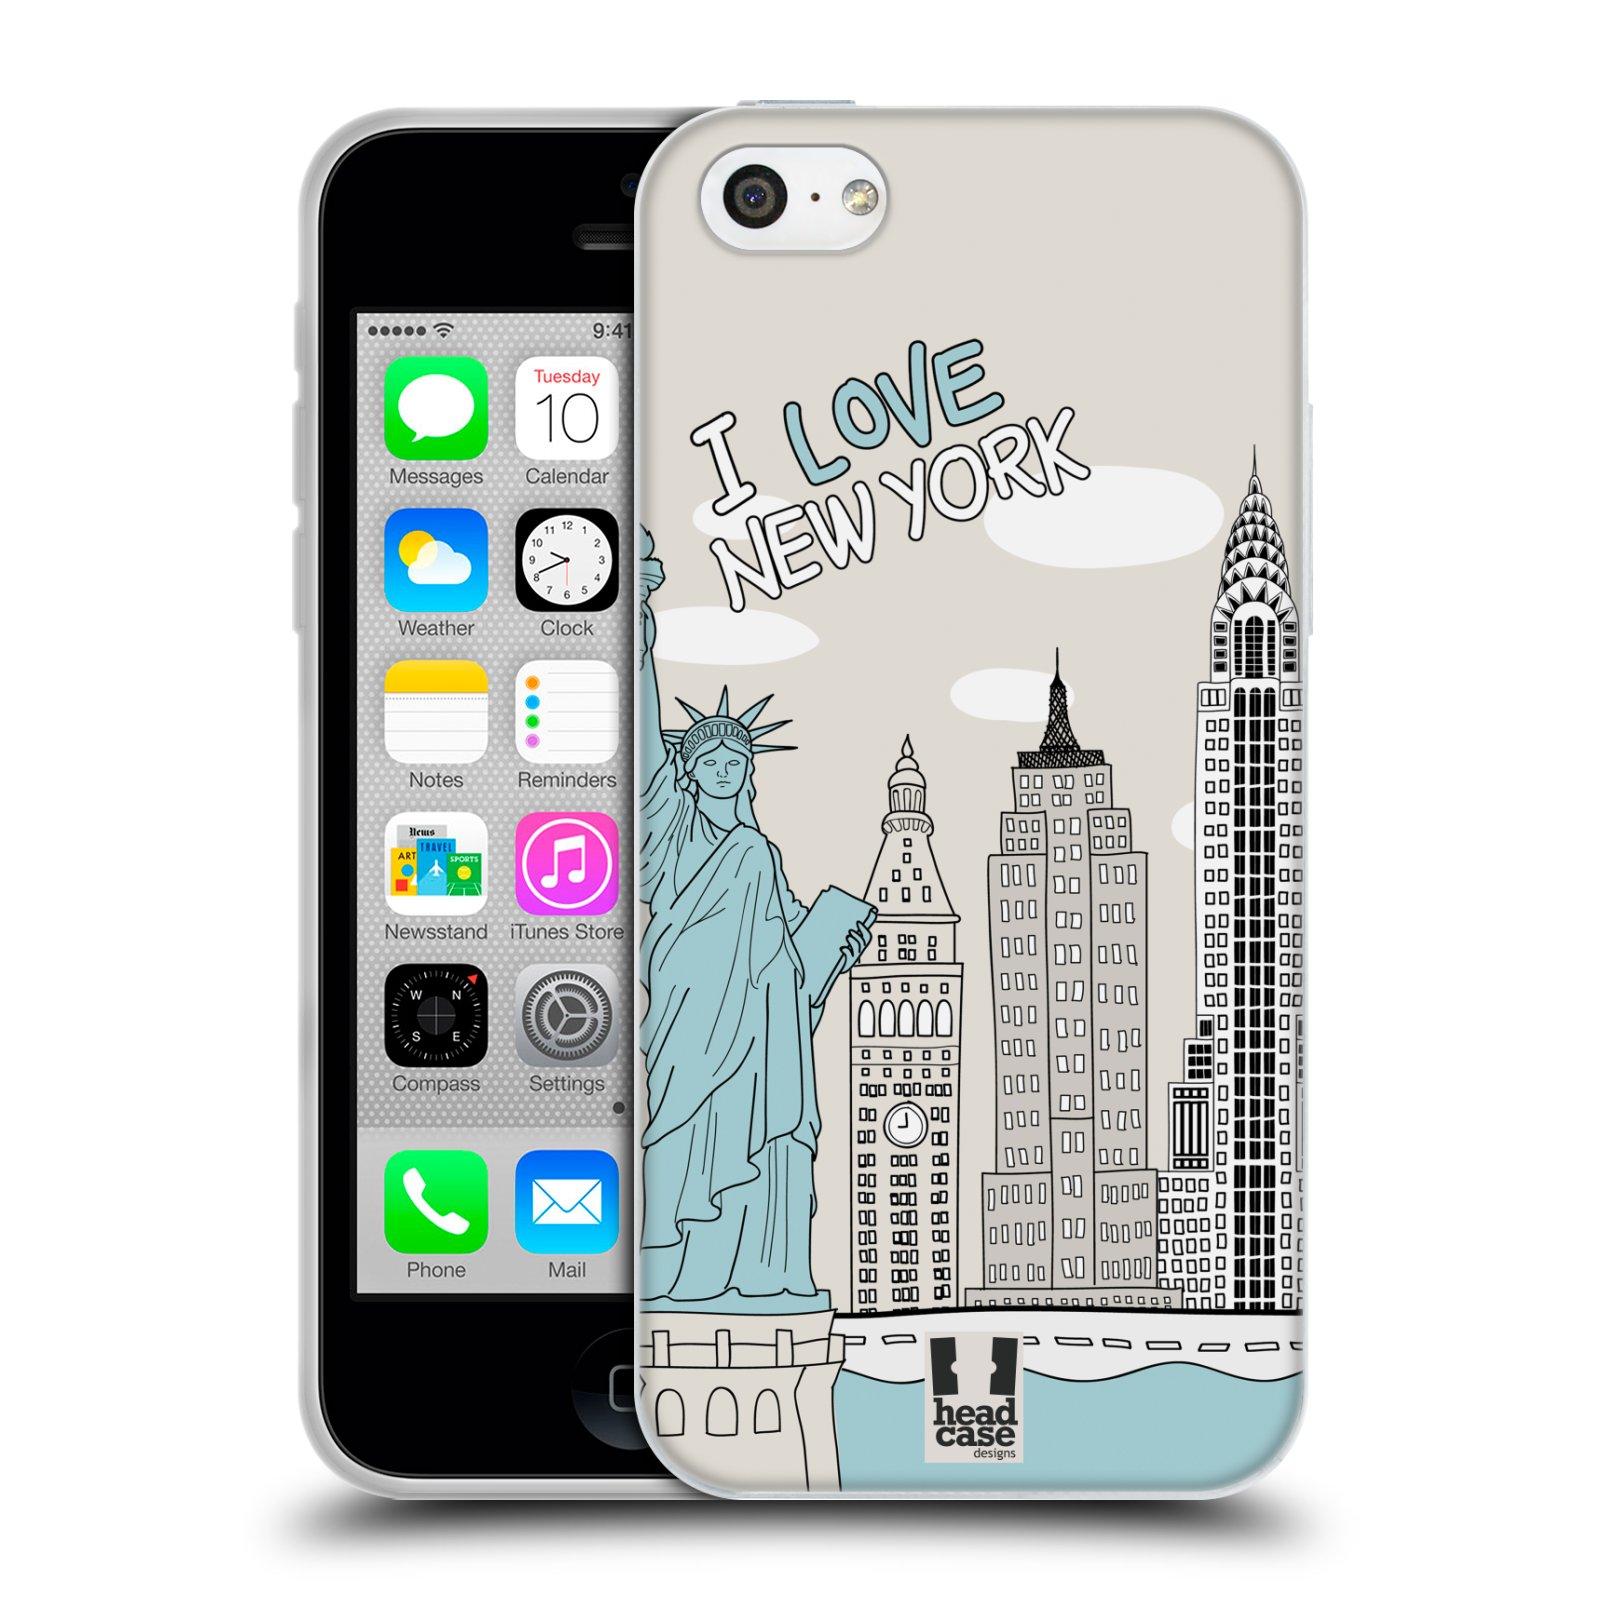 HEAD CASE silikonový obal na mobil Apple Iphone 5C vzor Kreslená městečka MODRÁ, USA, New York, I LOVE NEW YORK